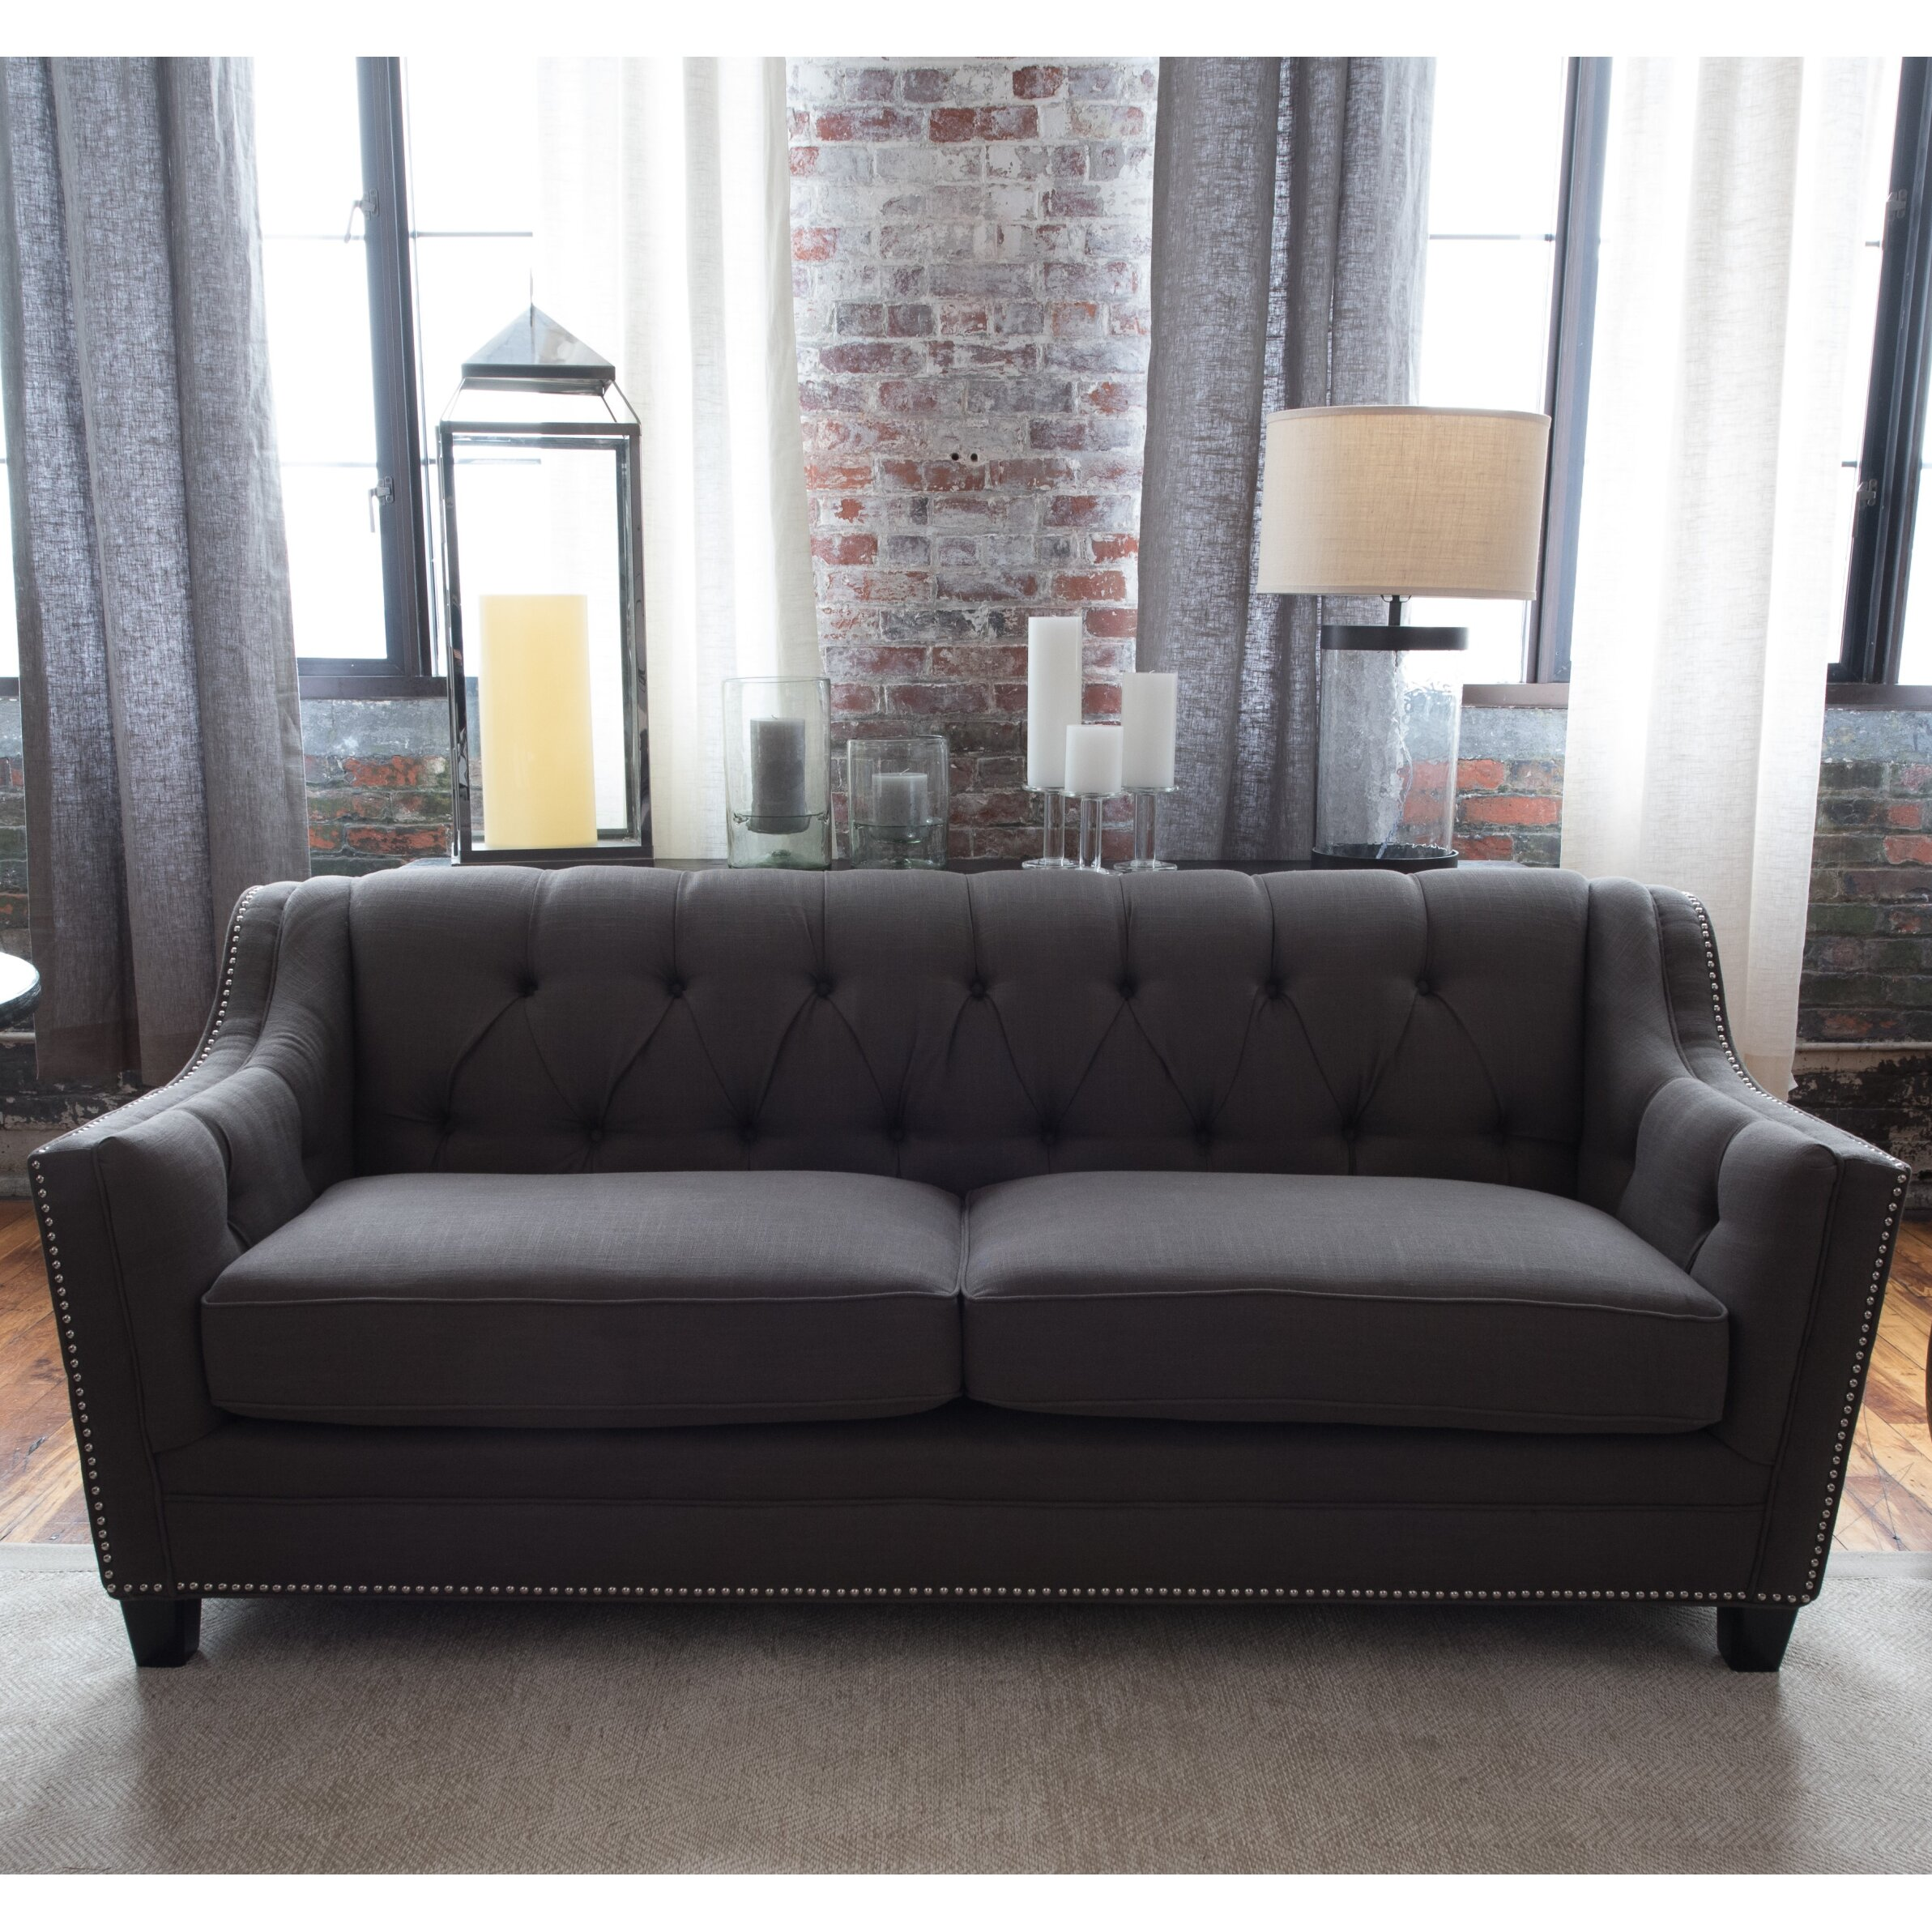 Canora grey addison sofa wayfair for Gray sectional sofa wayfair